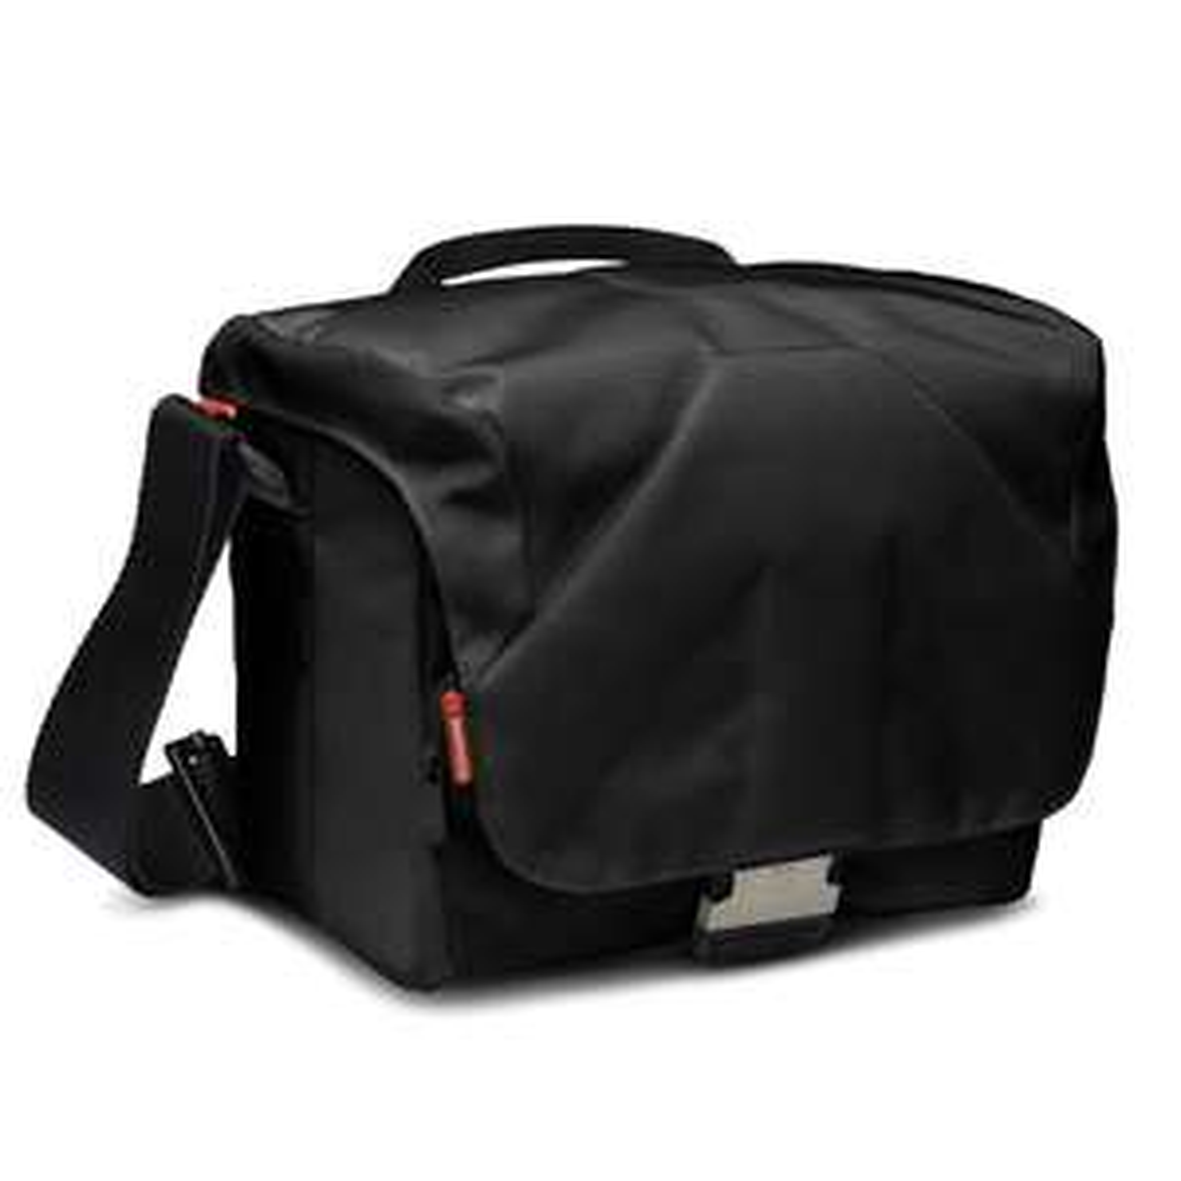 Manfrotto Bella II DSLR Shoulder Bag £9.99 delivered @ gwcameras / eBay (Bella III £12.99)